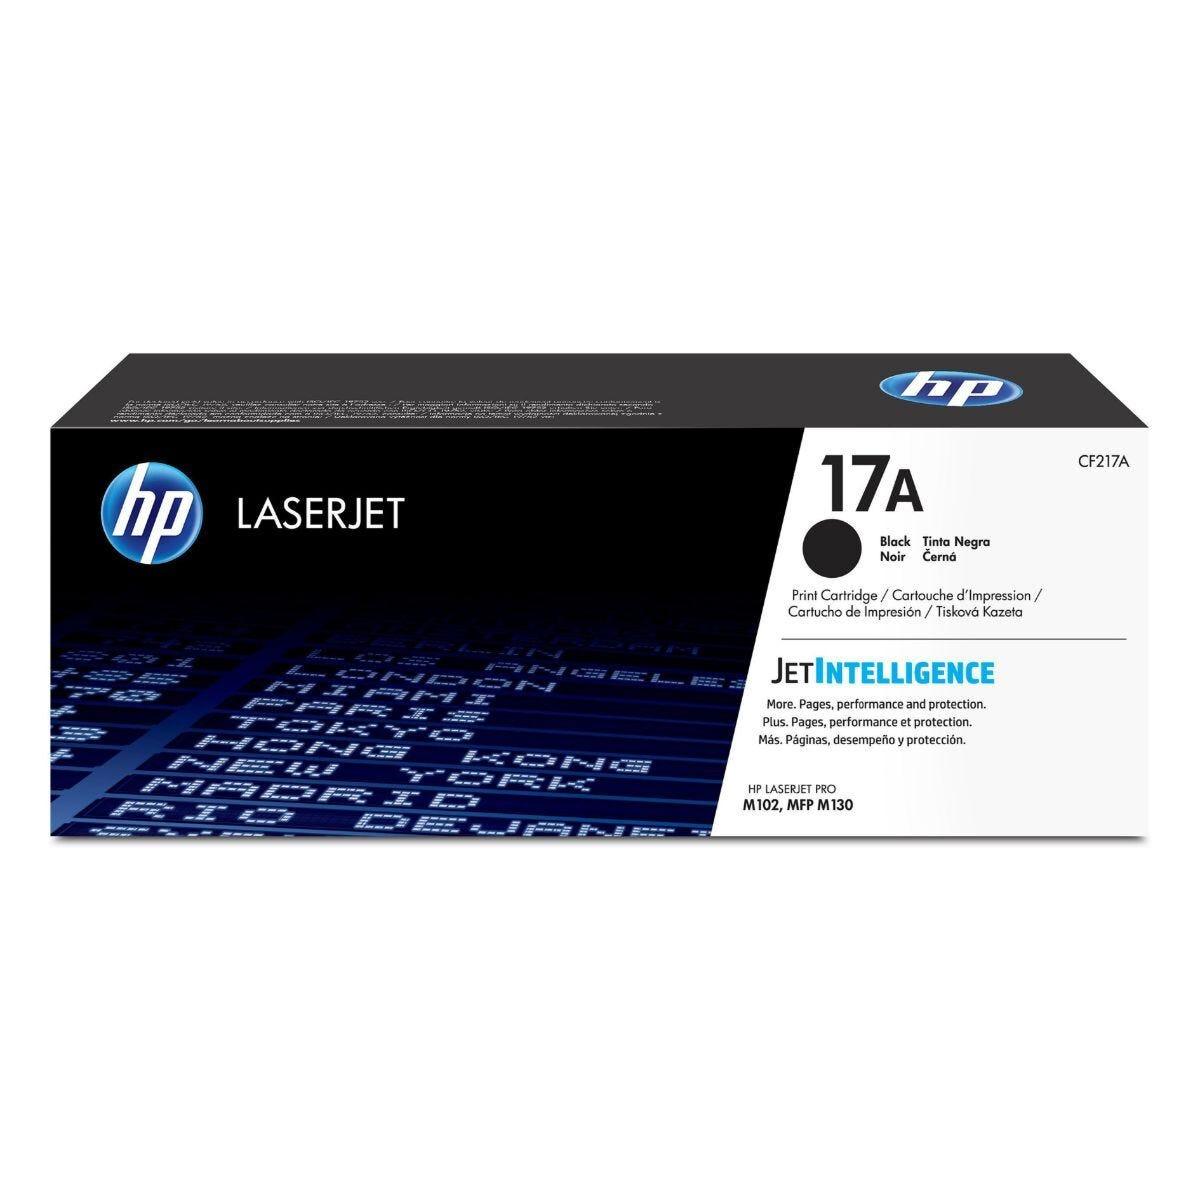 HP 17A Laser Printer Ink Toner Cartridge Black